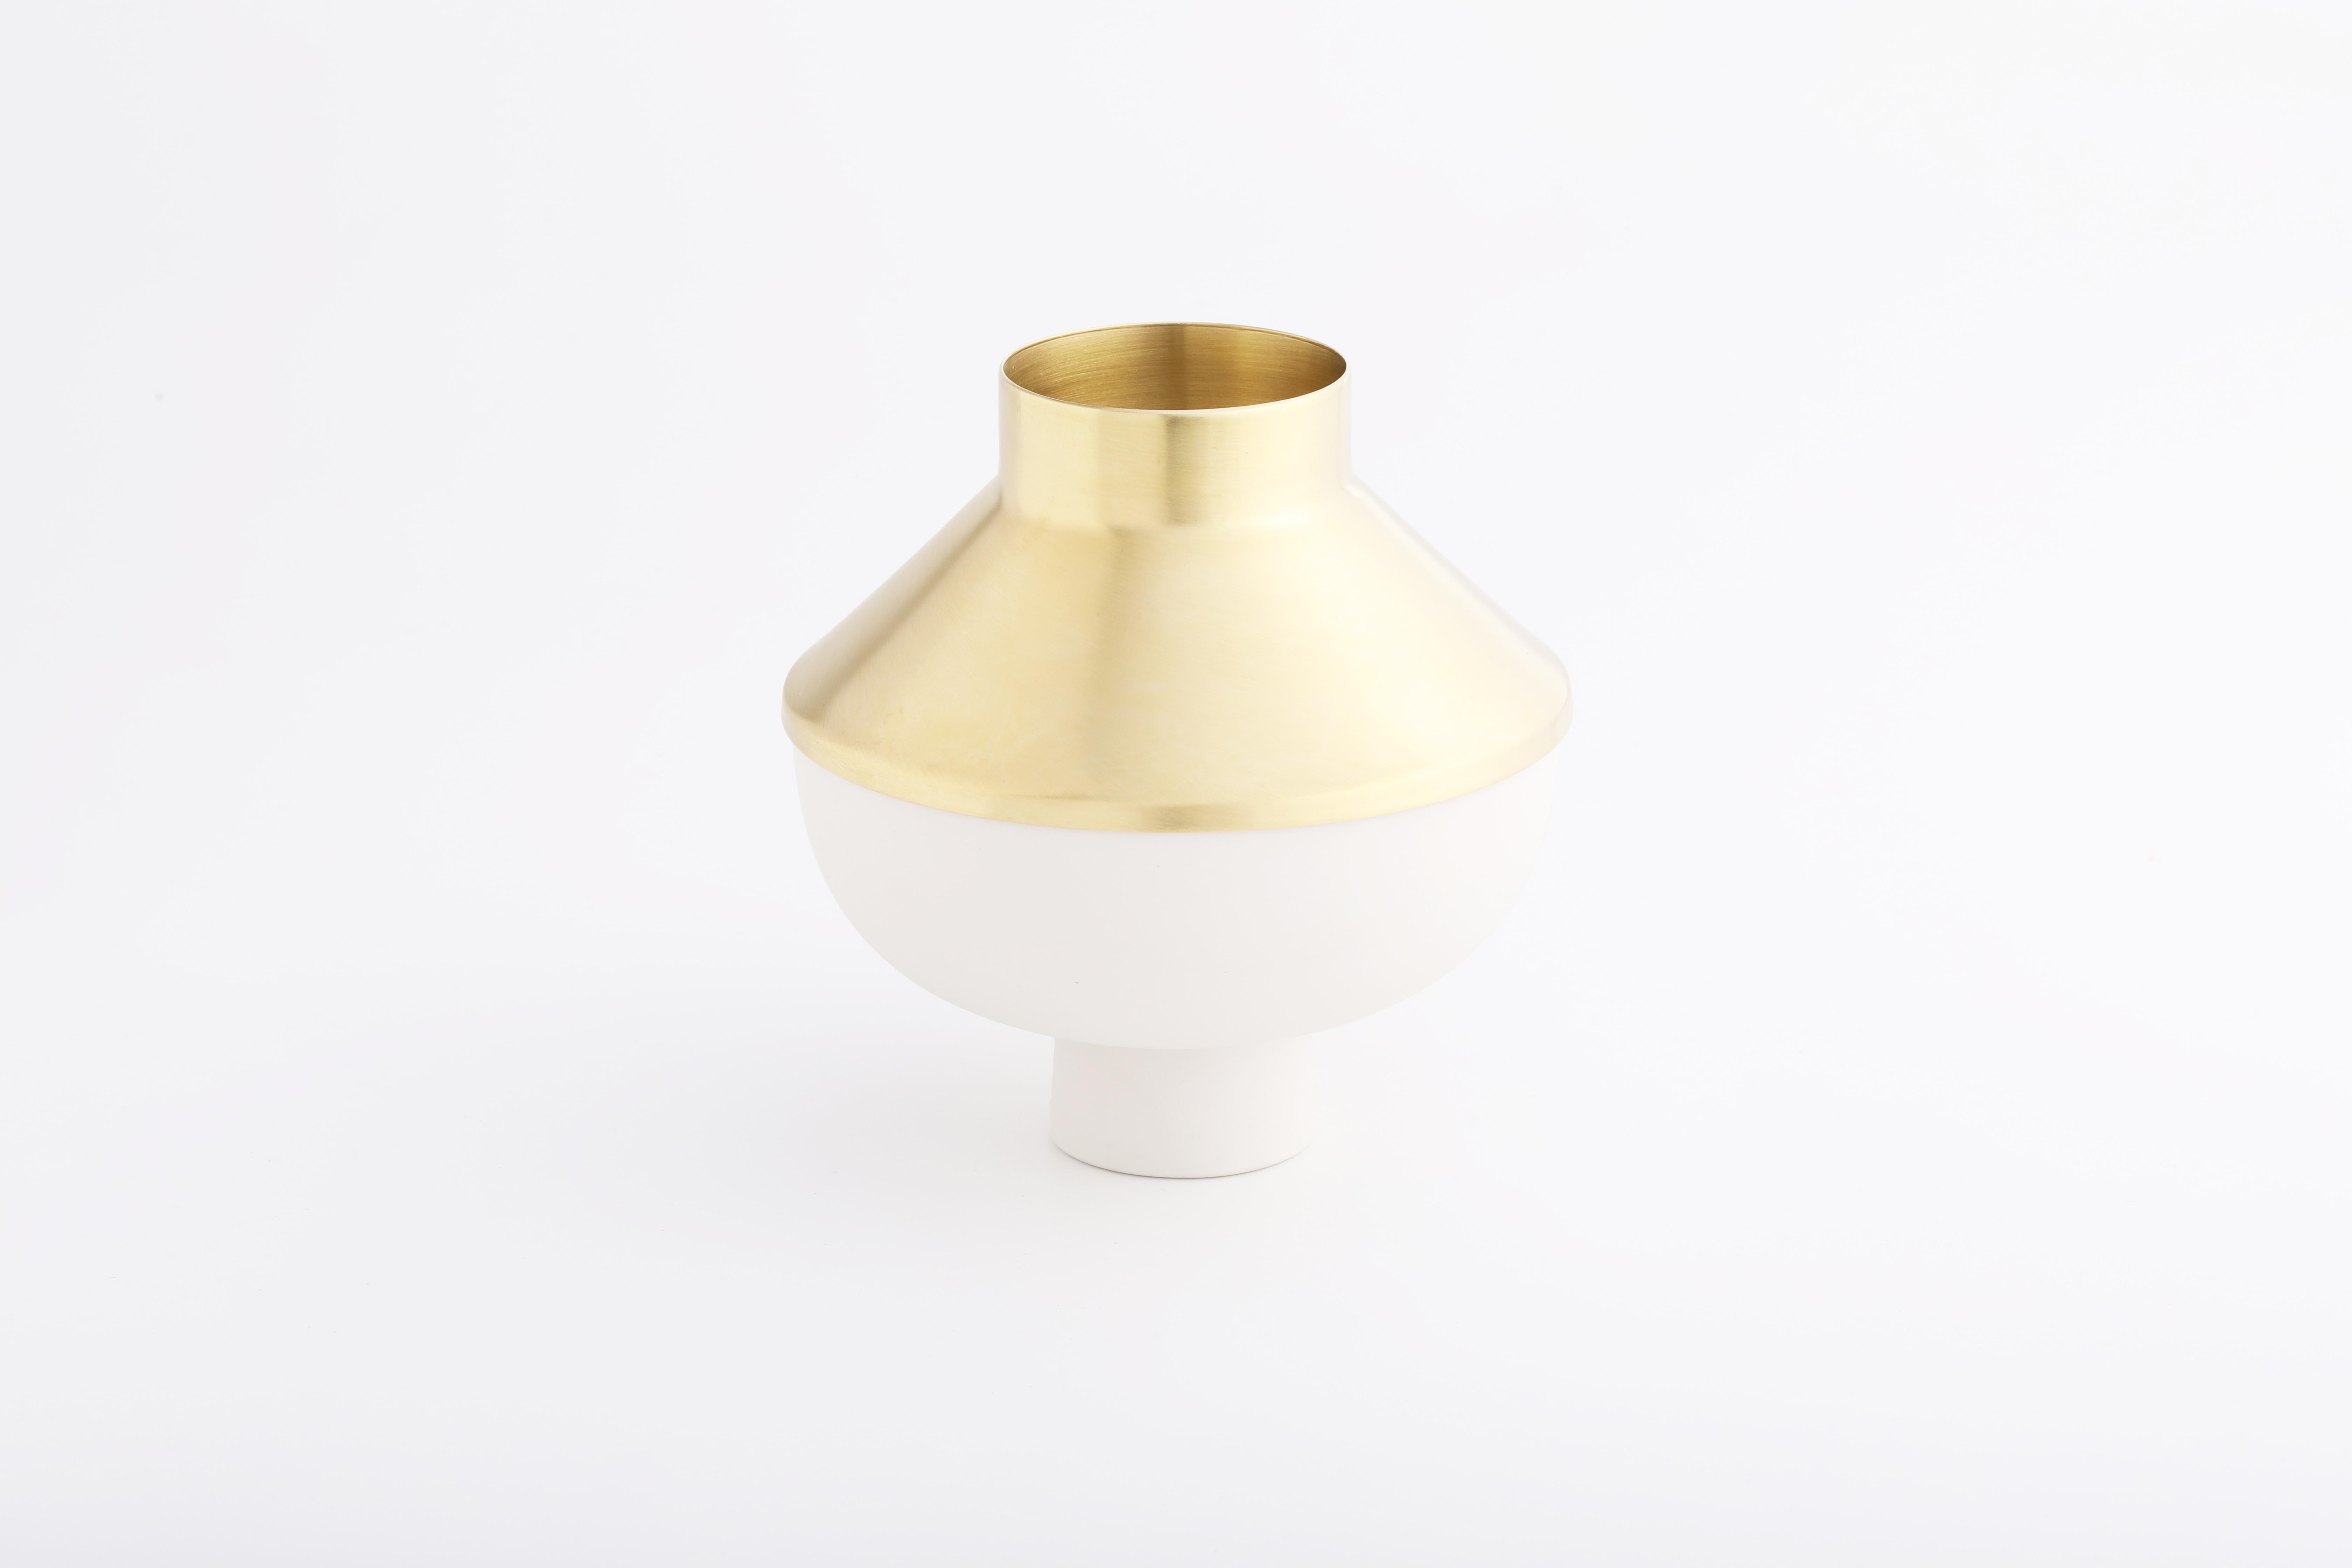 Set 4 (白瓷黃銅款 / White,Brass)